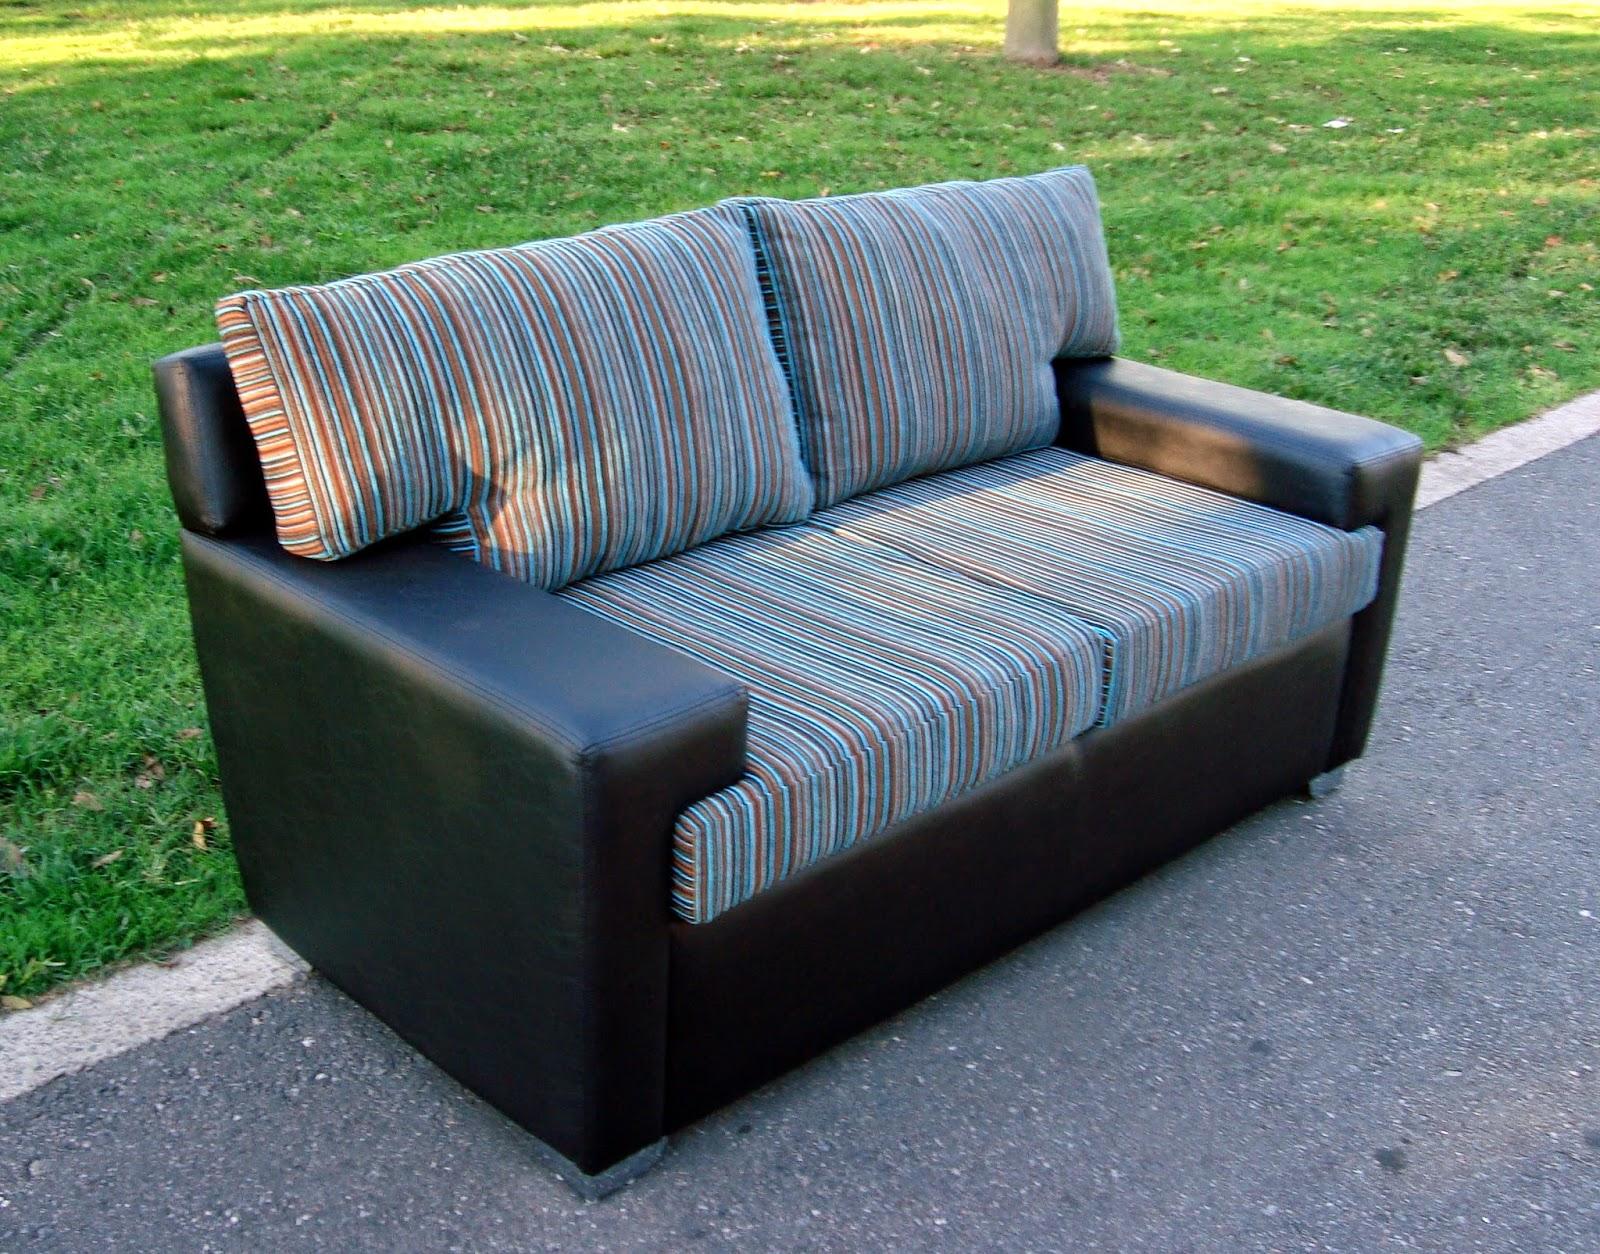 Brancaleone tapizados sofa pipa de 2 cuerpos - Tapizado de sofas ...